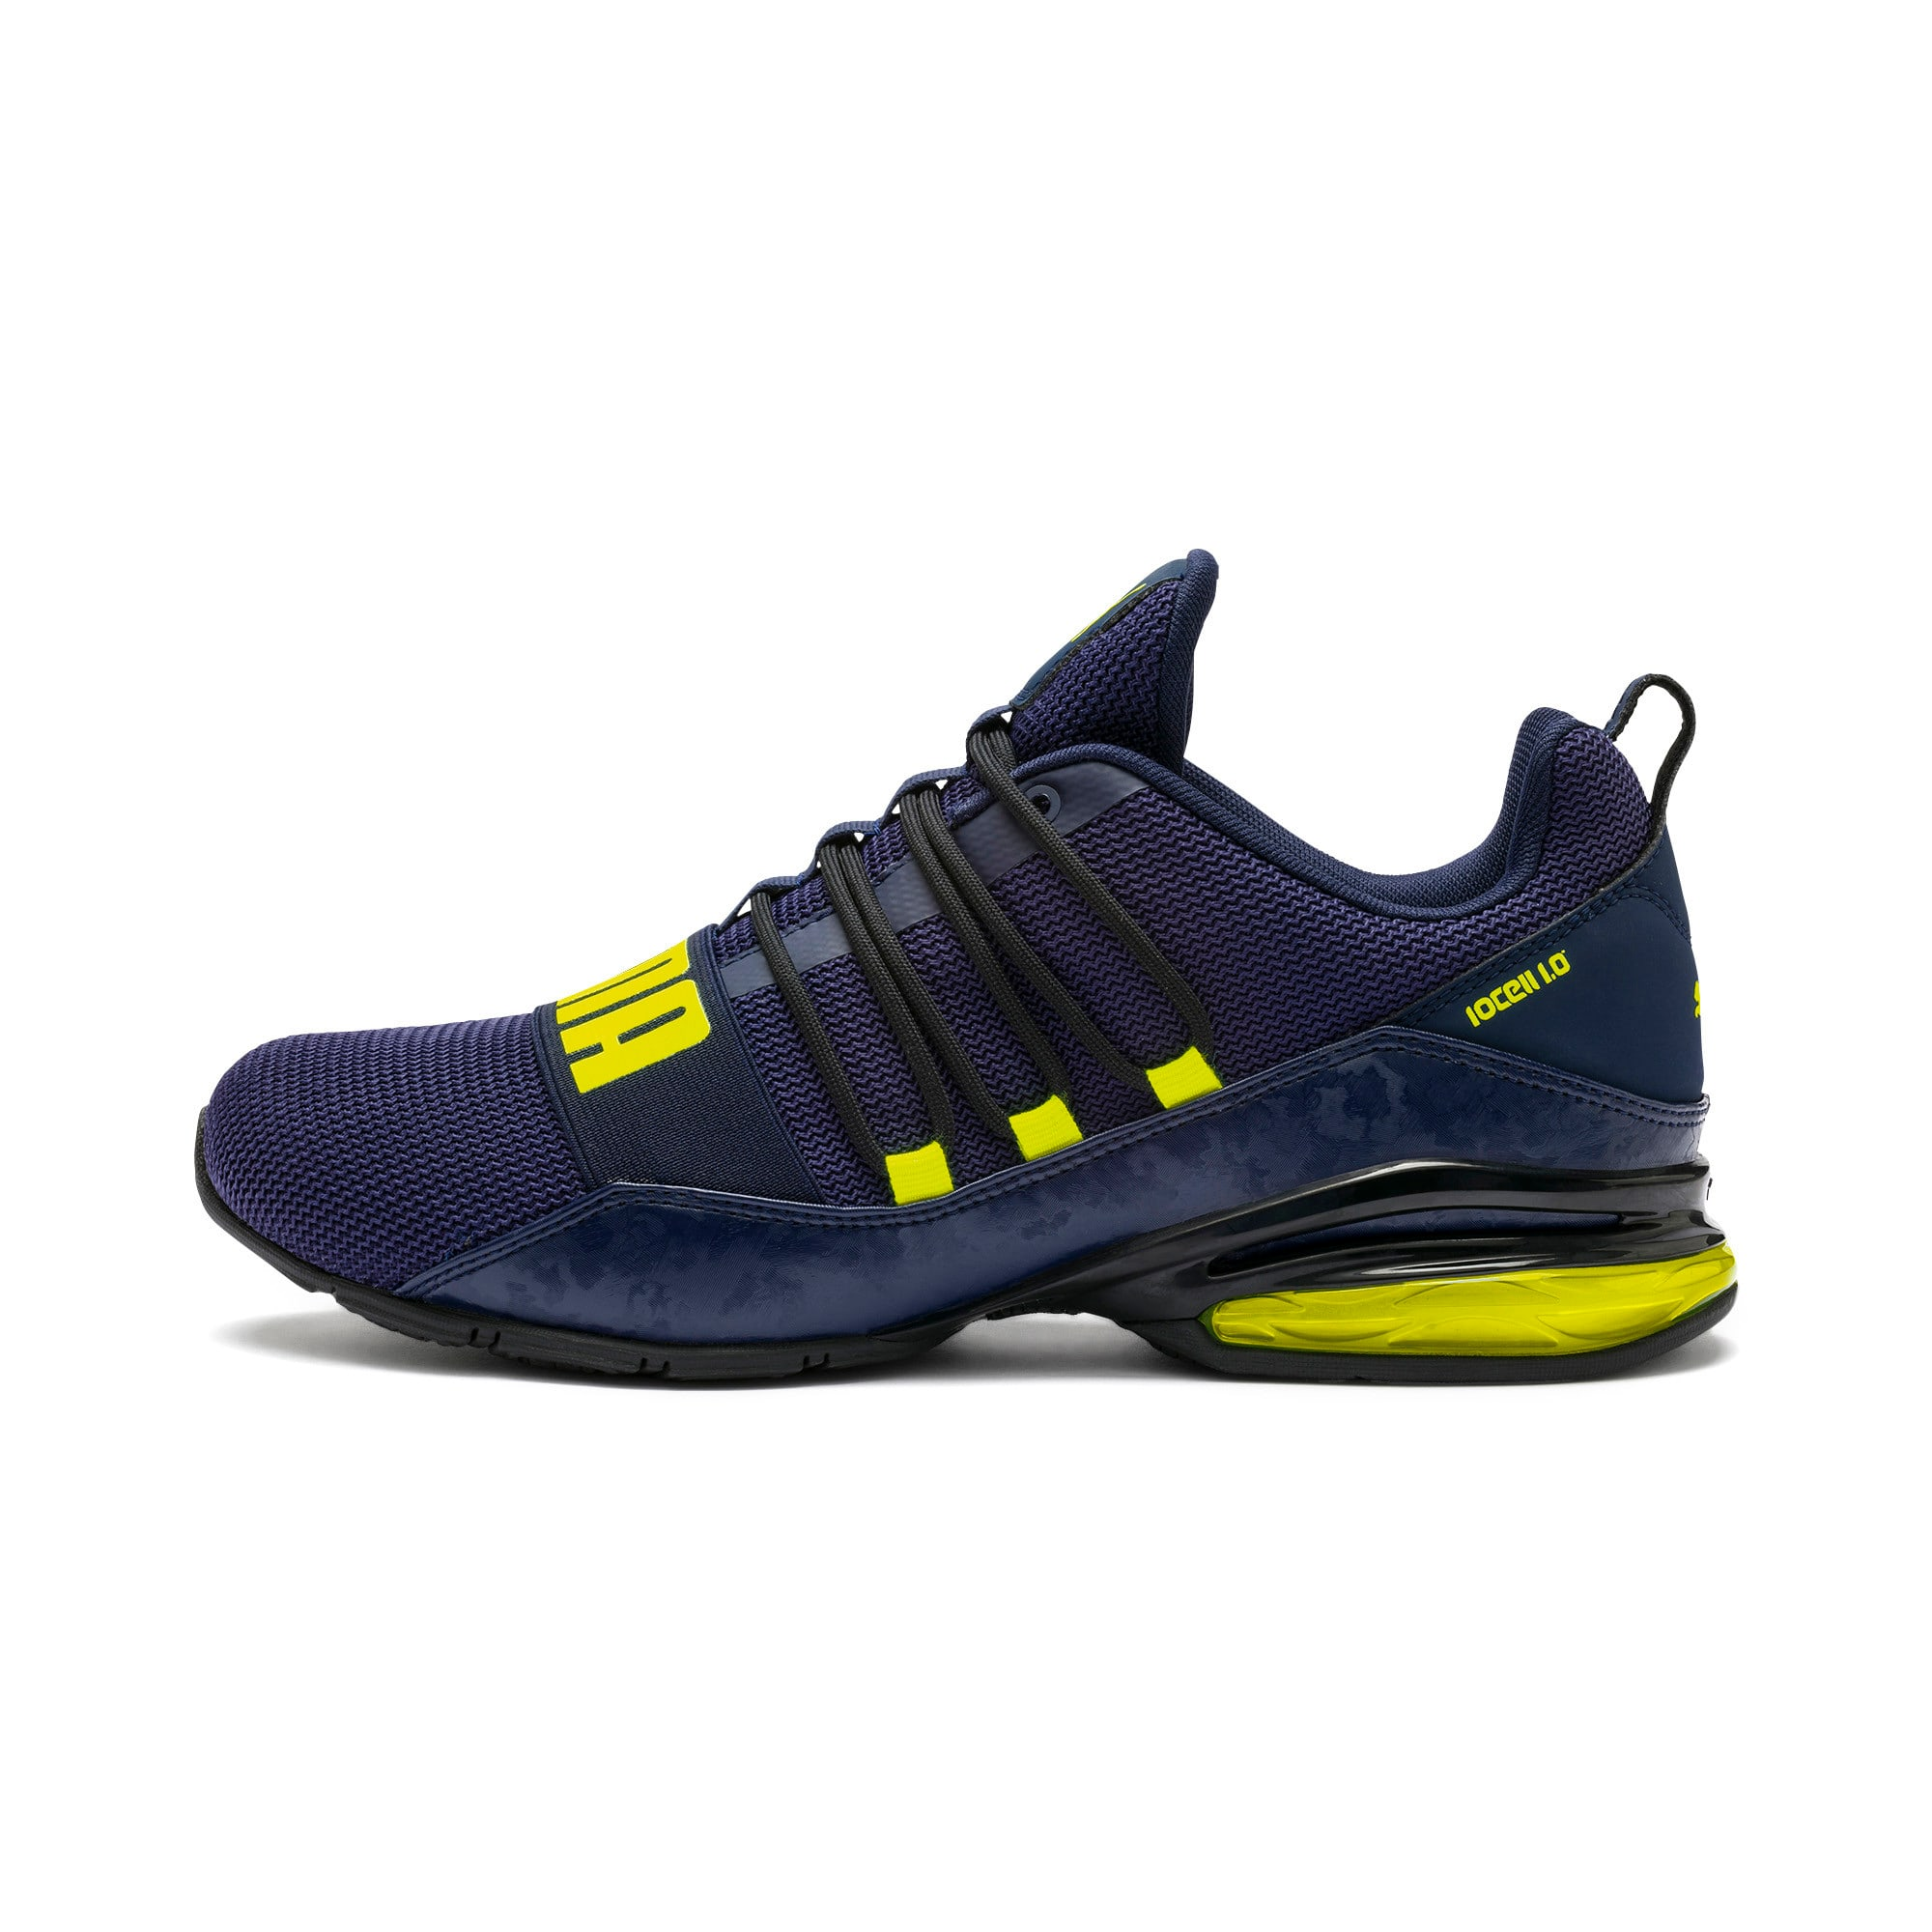 Thumbnail 1 of CELL Regulate Camo Men's Training Shoes, Peacoat-Yellow Alert, medium